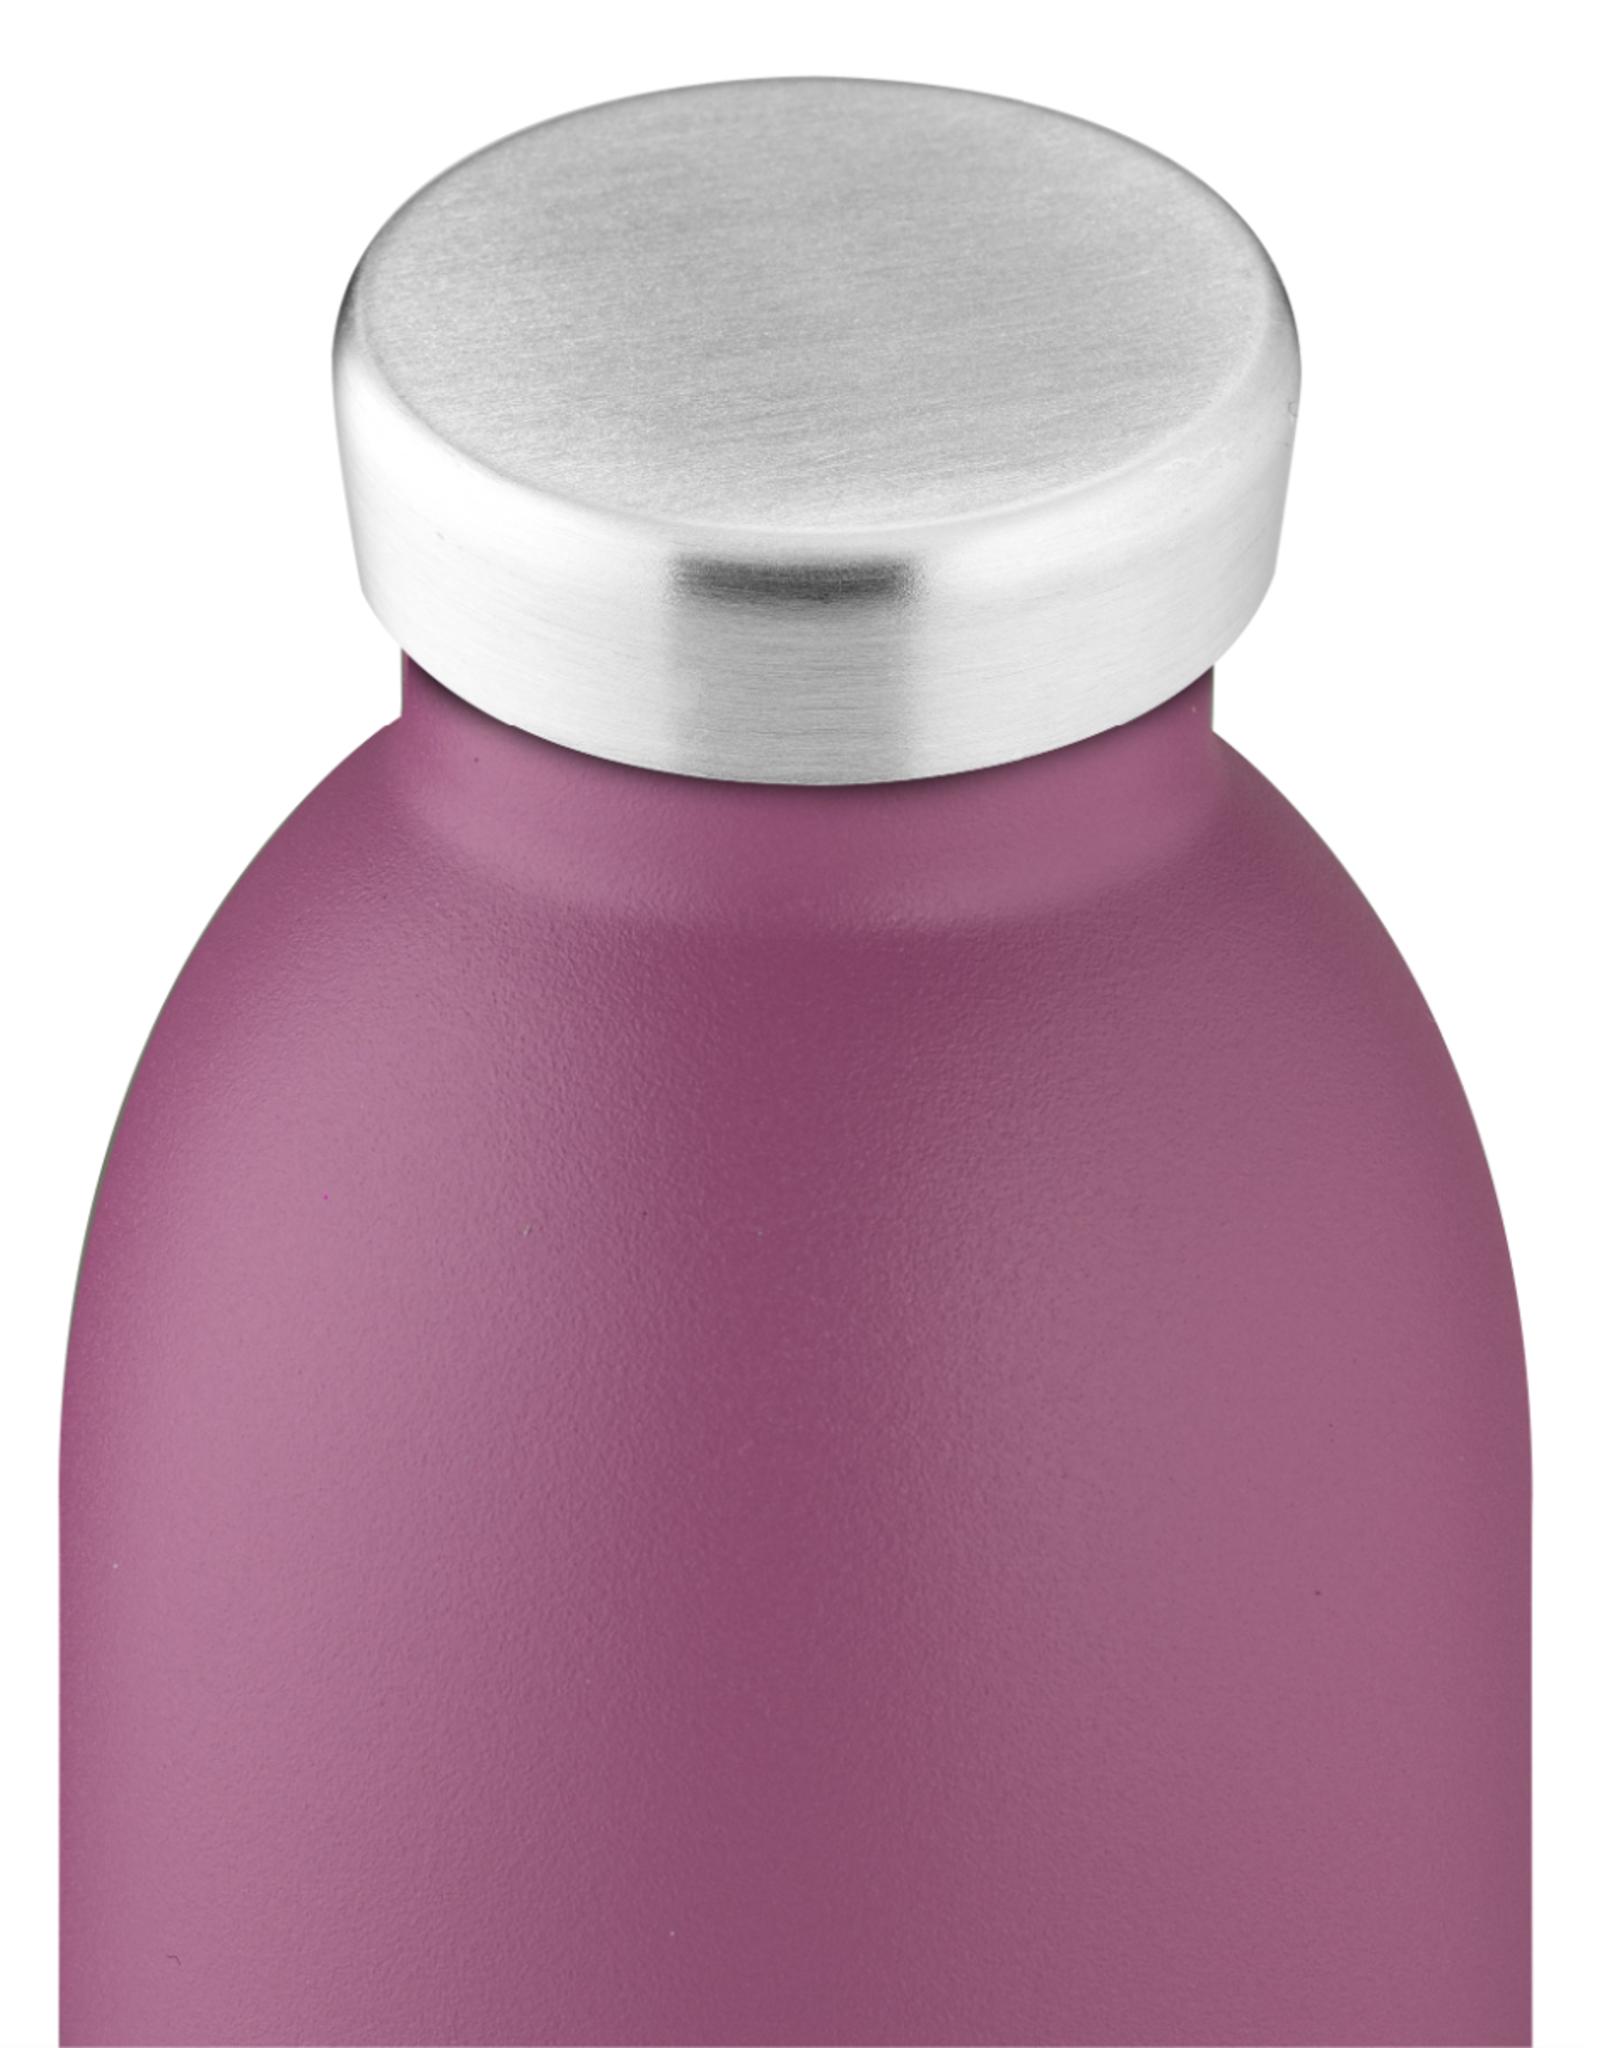 24 bottles Clima bottle - Mauve 500 ml